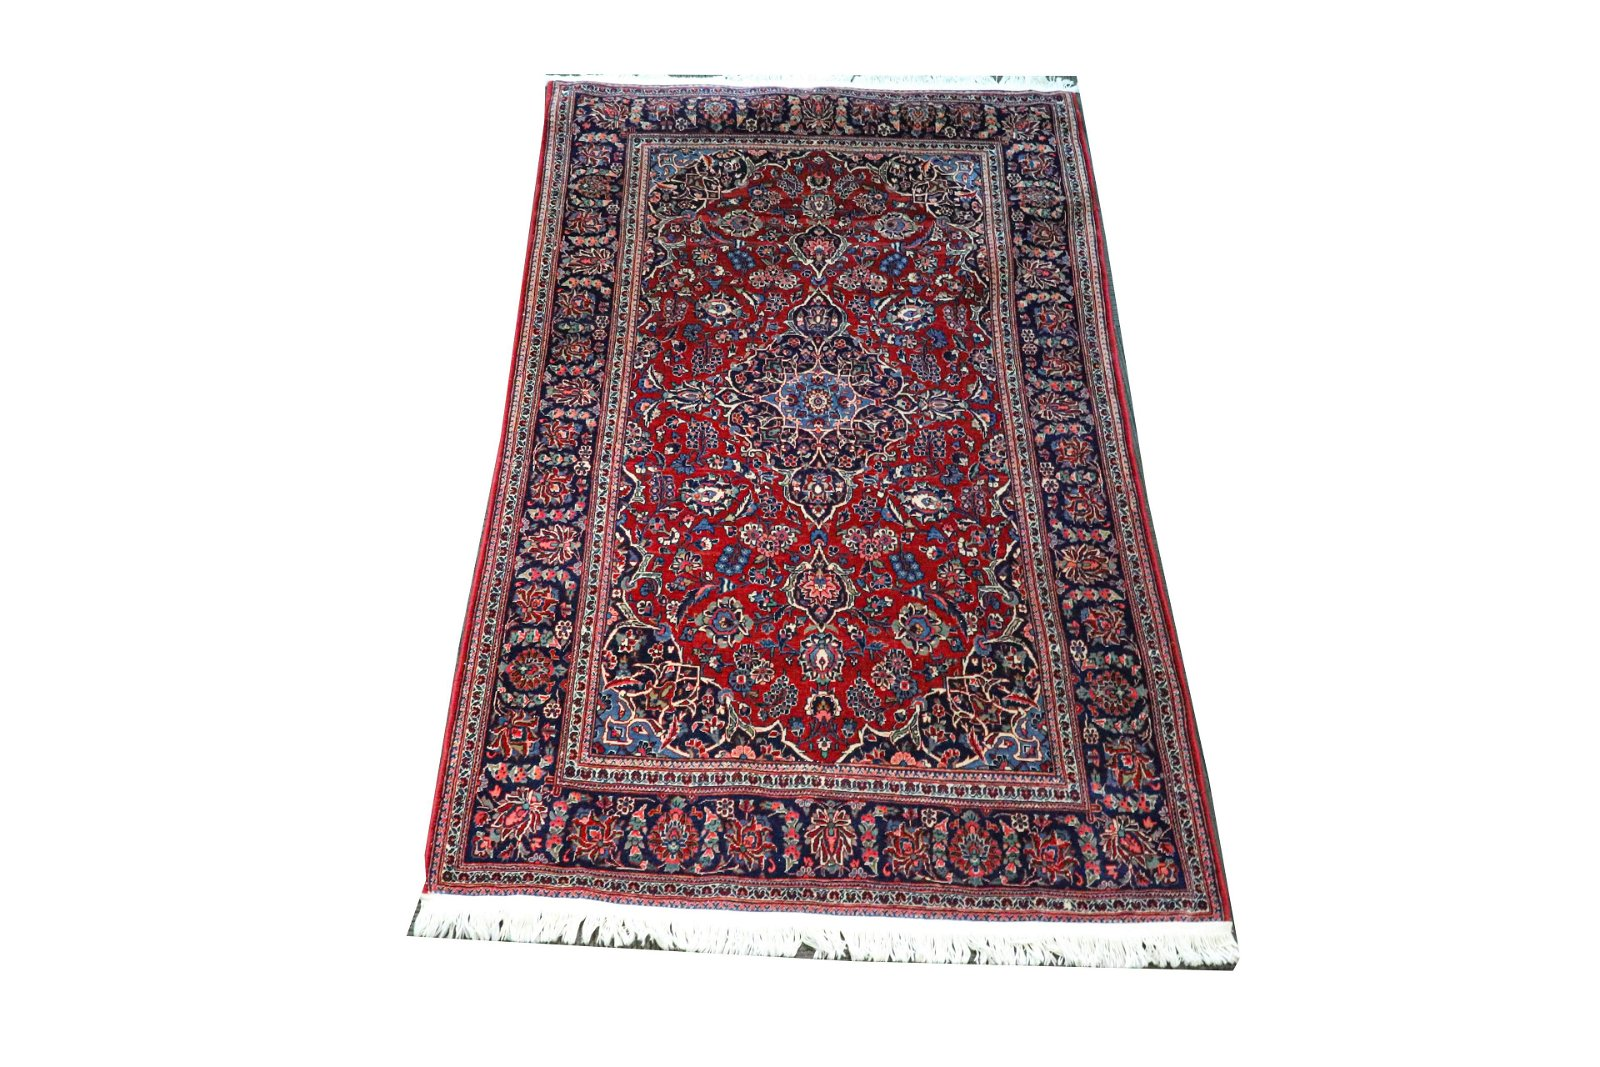 "Persian Floral Rug 4' 2.5"" x 6' 9.5"""